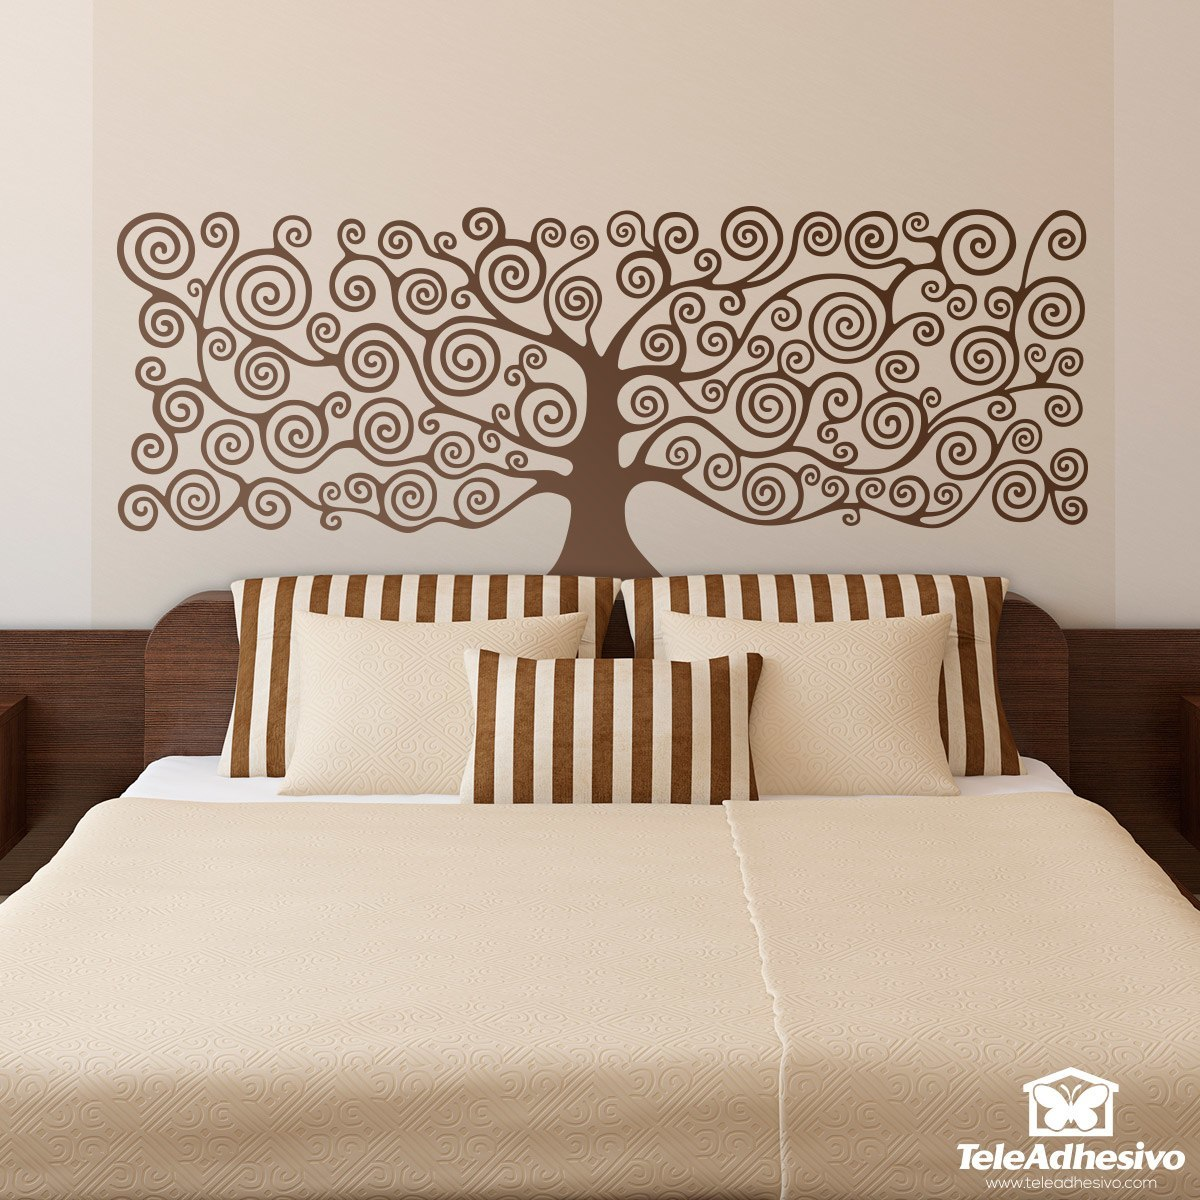 Vinilo decorativo del rbol de la vida de klimt for Vinilos para dormitorios de matrimonio